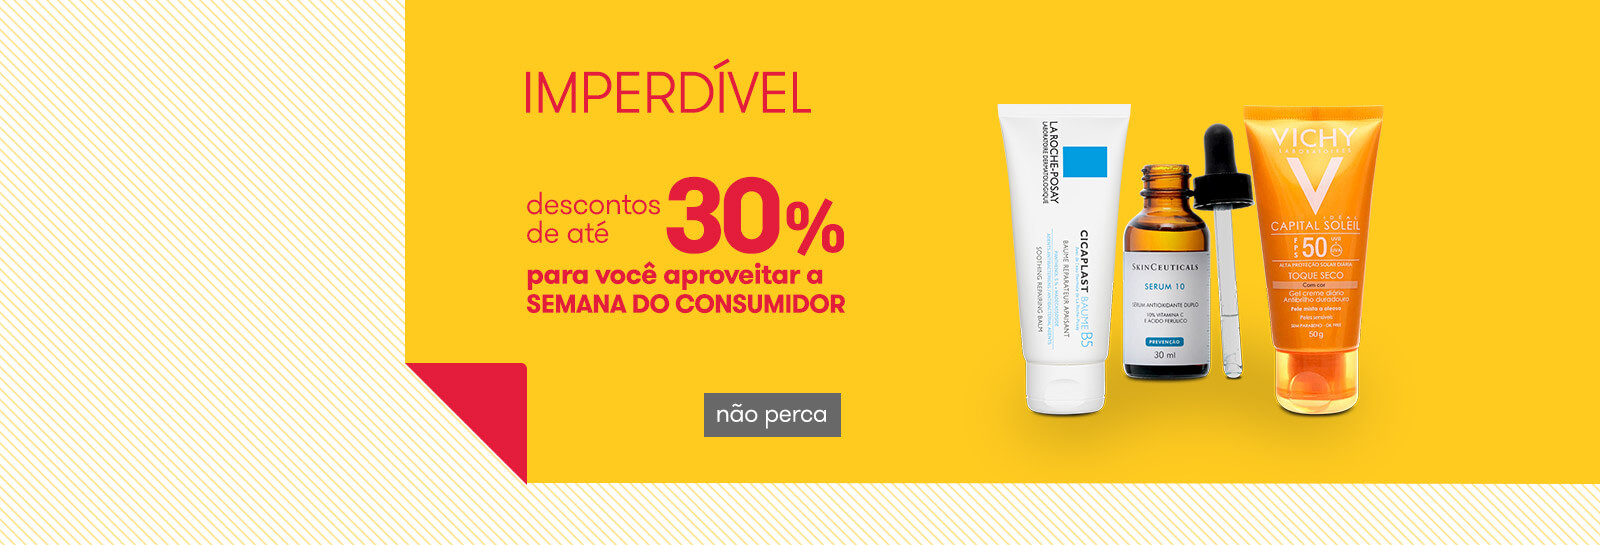 Semana_do_Consumidor_Loreal_DCA